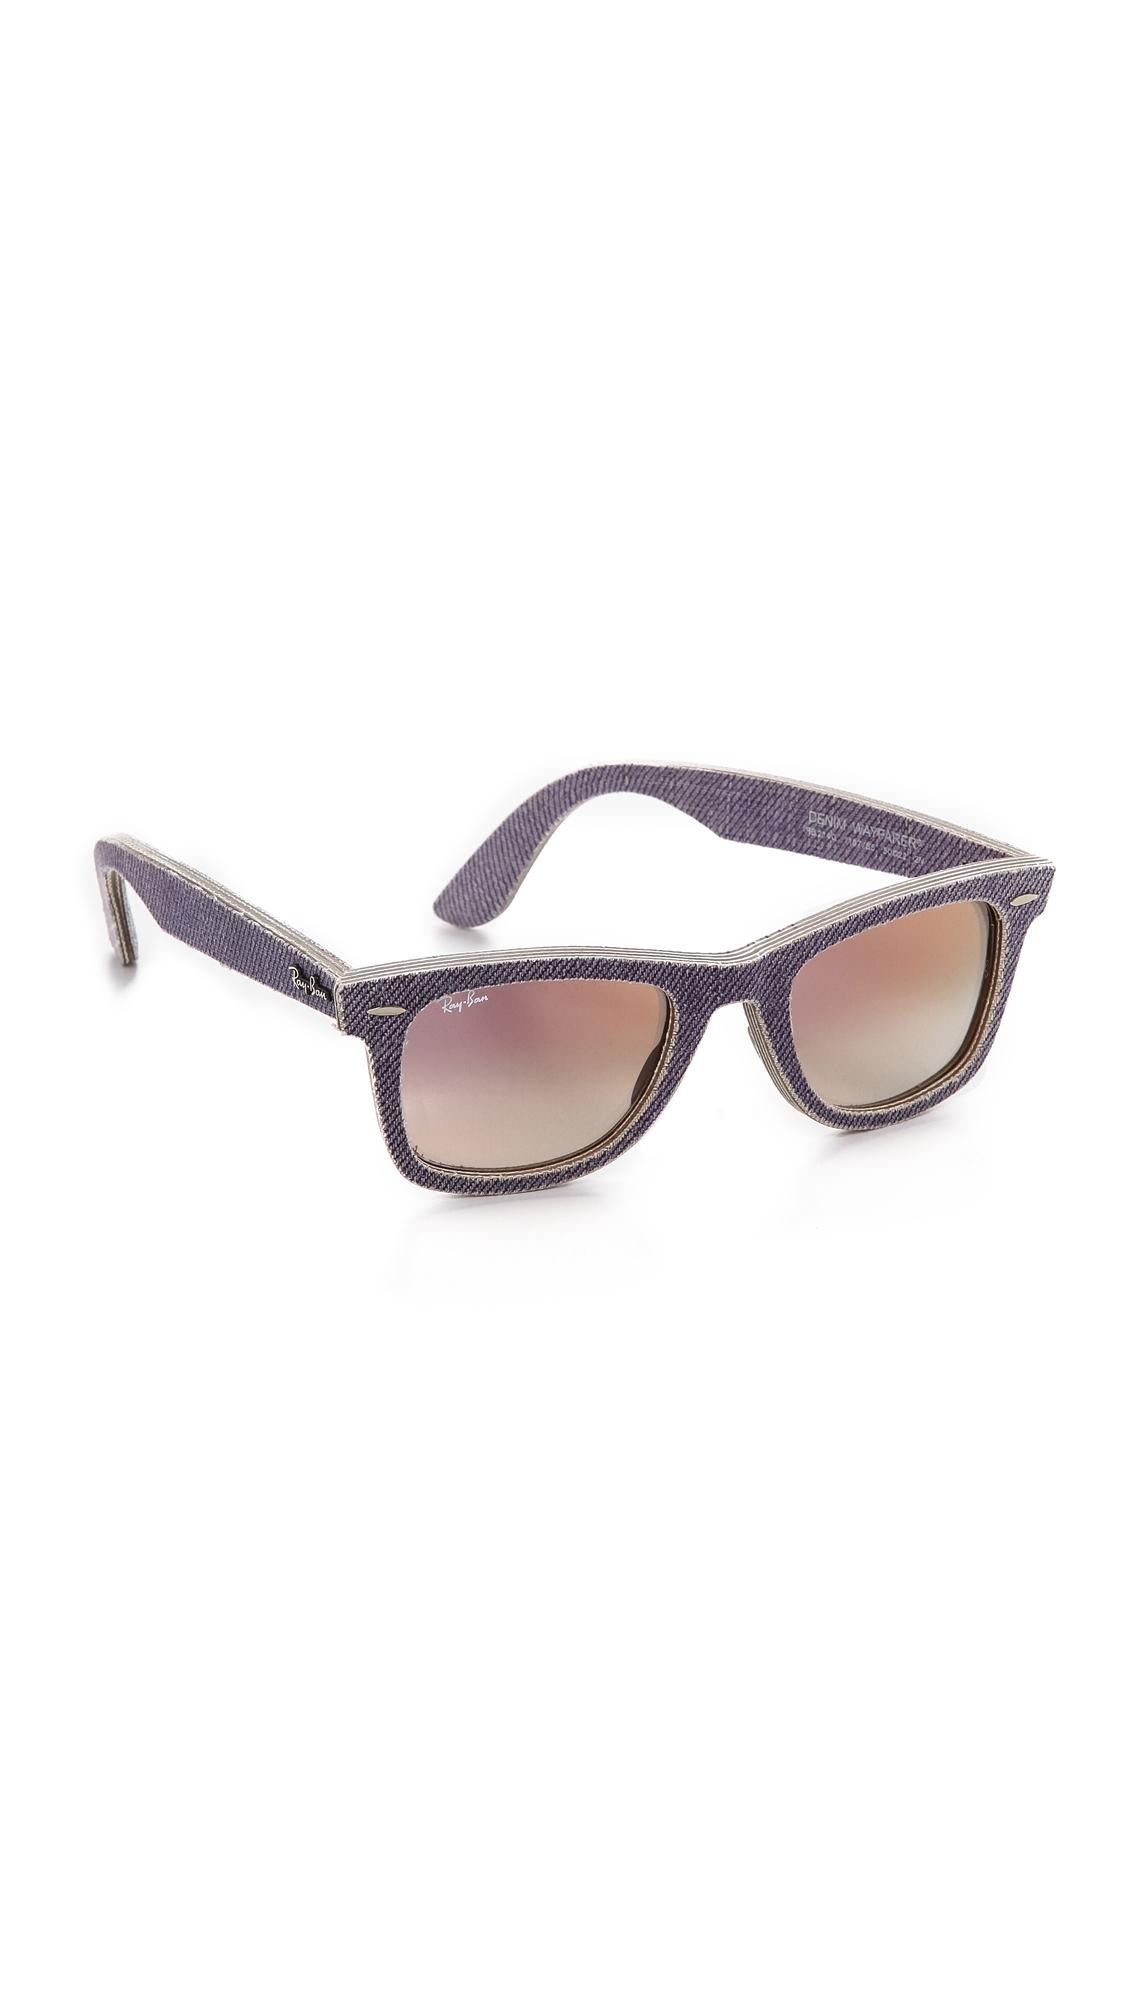 01ccadfd80e32 Purple Ray Ban Wayfarer Sunglasses « Heritage Malta